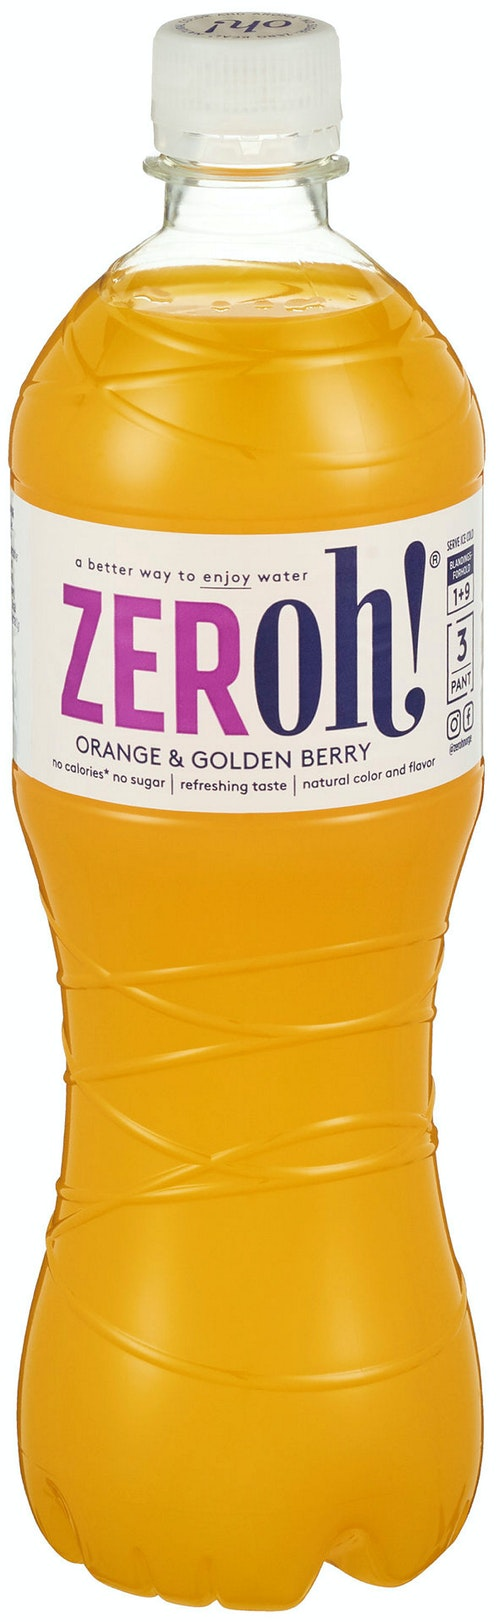 Zeroh! Orange & Golden Berry 0,8 l